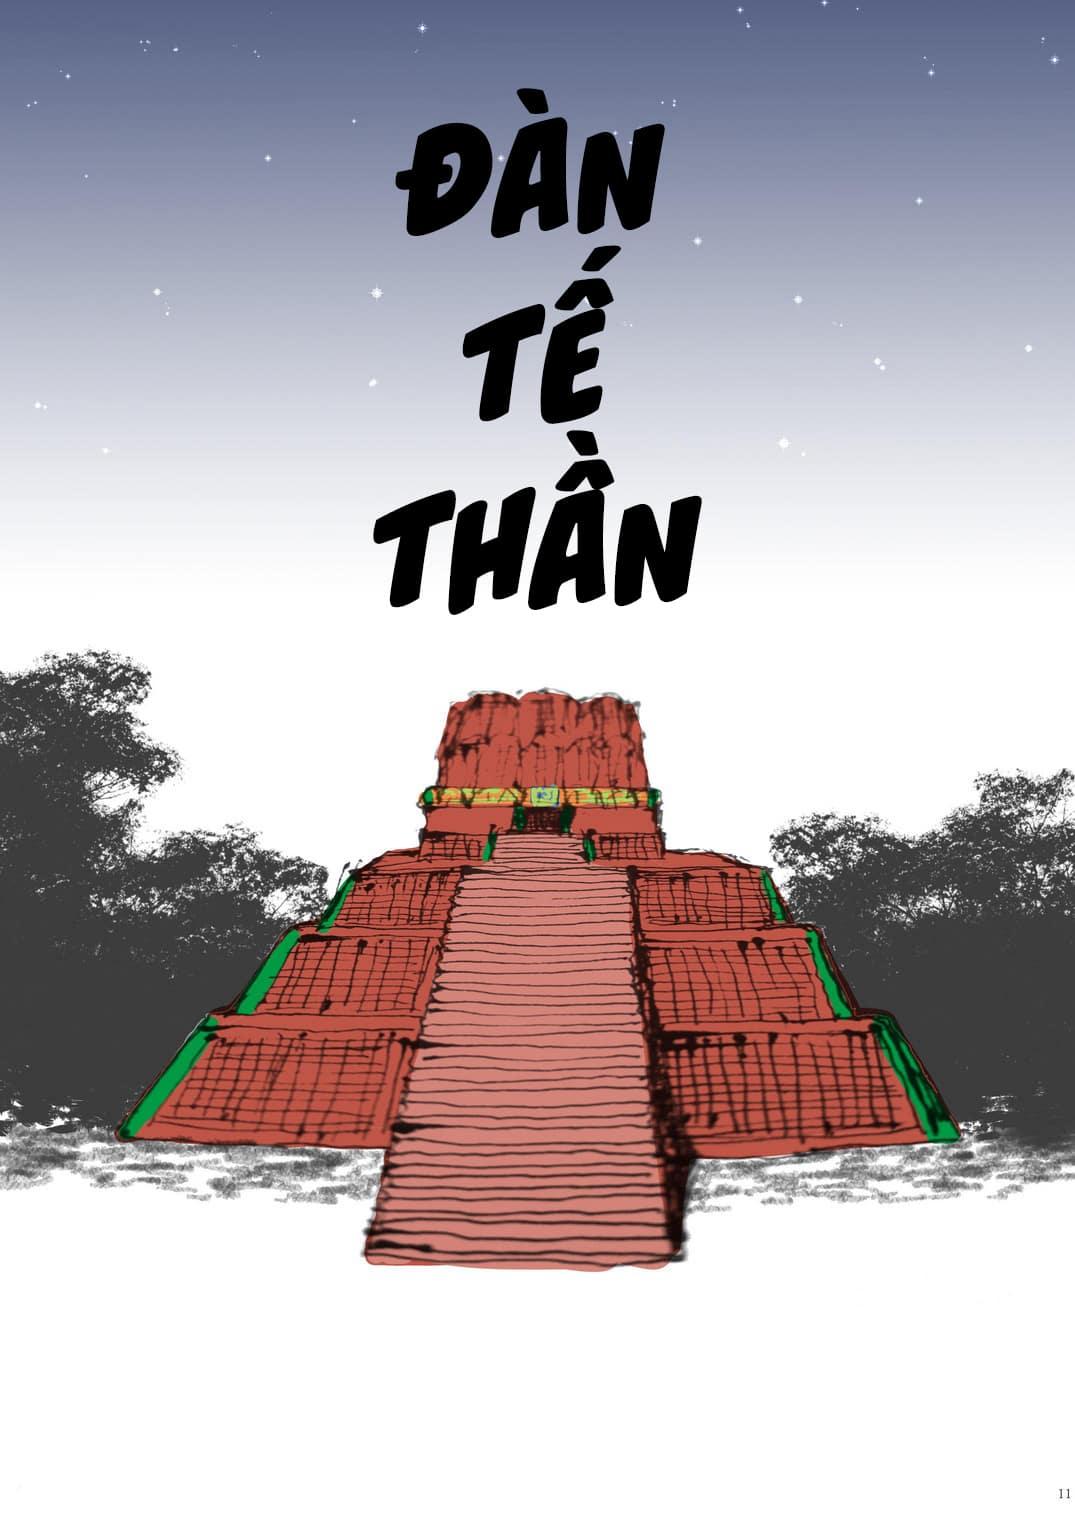 [Goma Saba] LỄ HIẾN TẾ HOAN LẠC - Tác giả Goma Saba - Trang 11